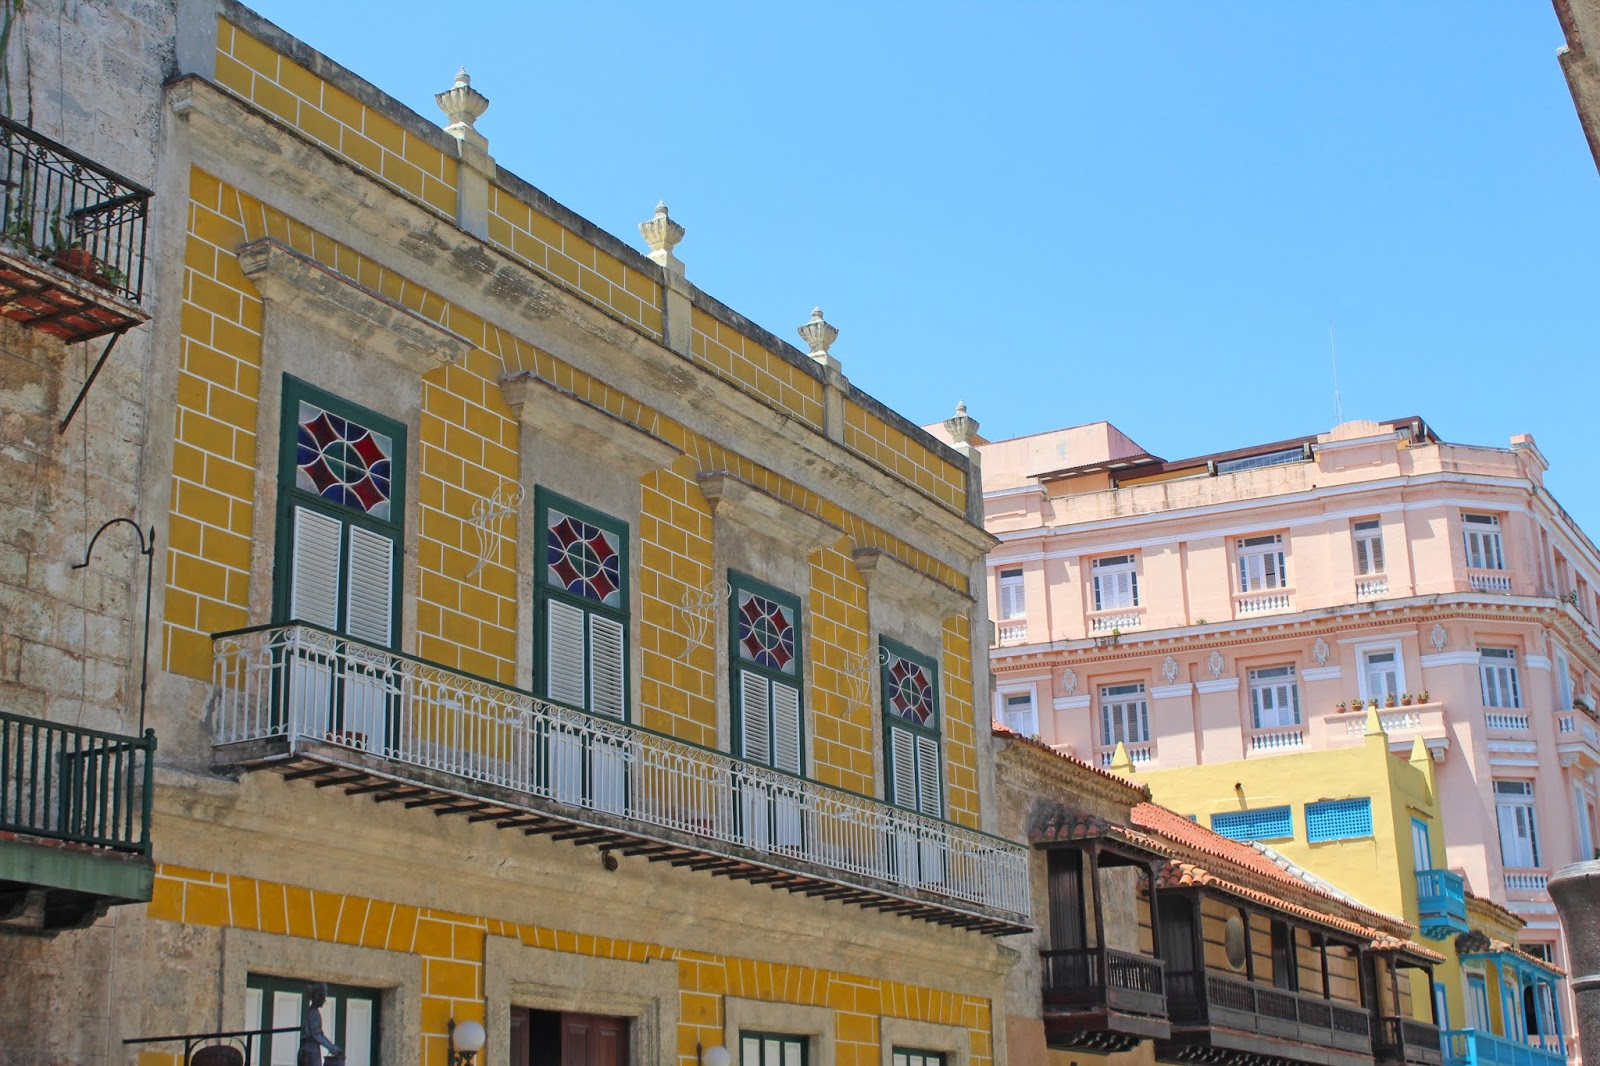 making restorations Havana day 3.4